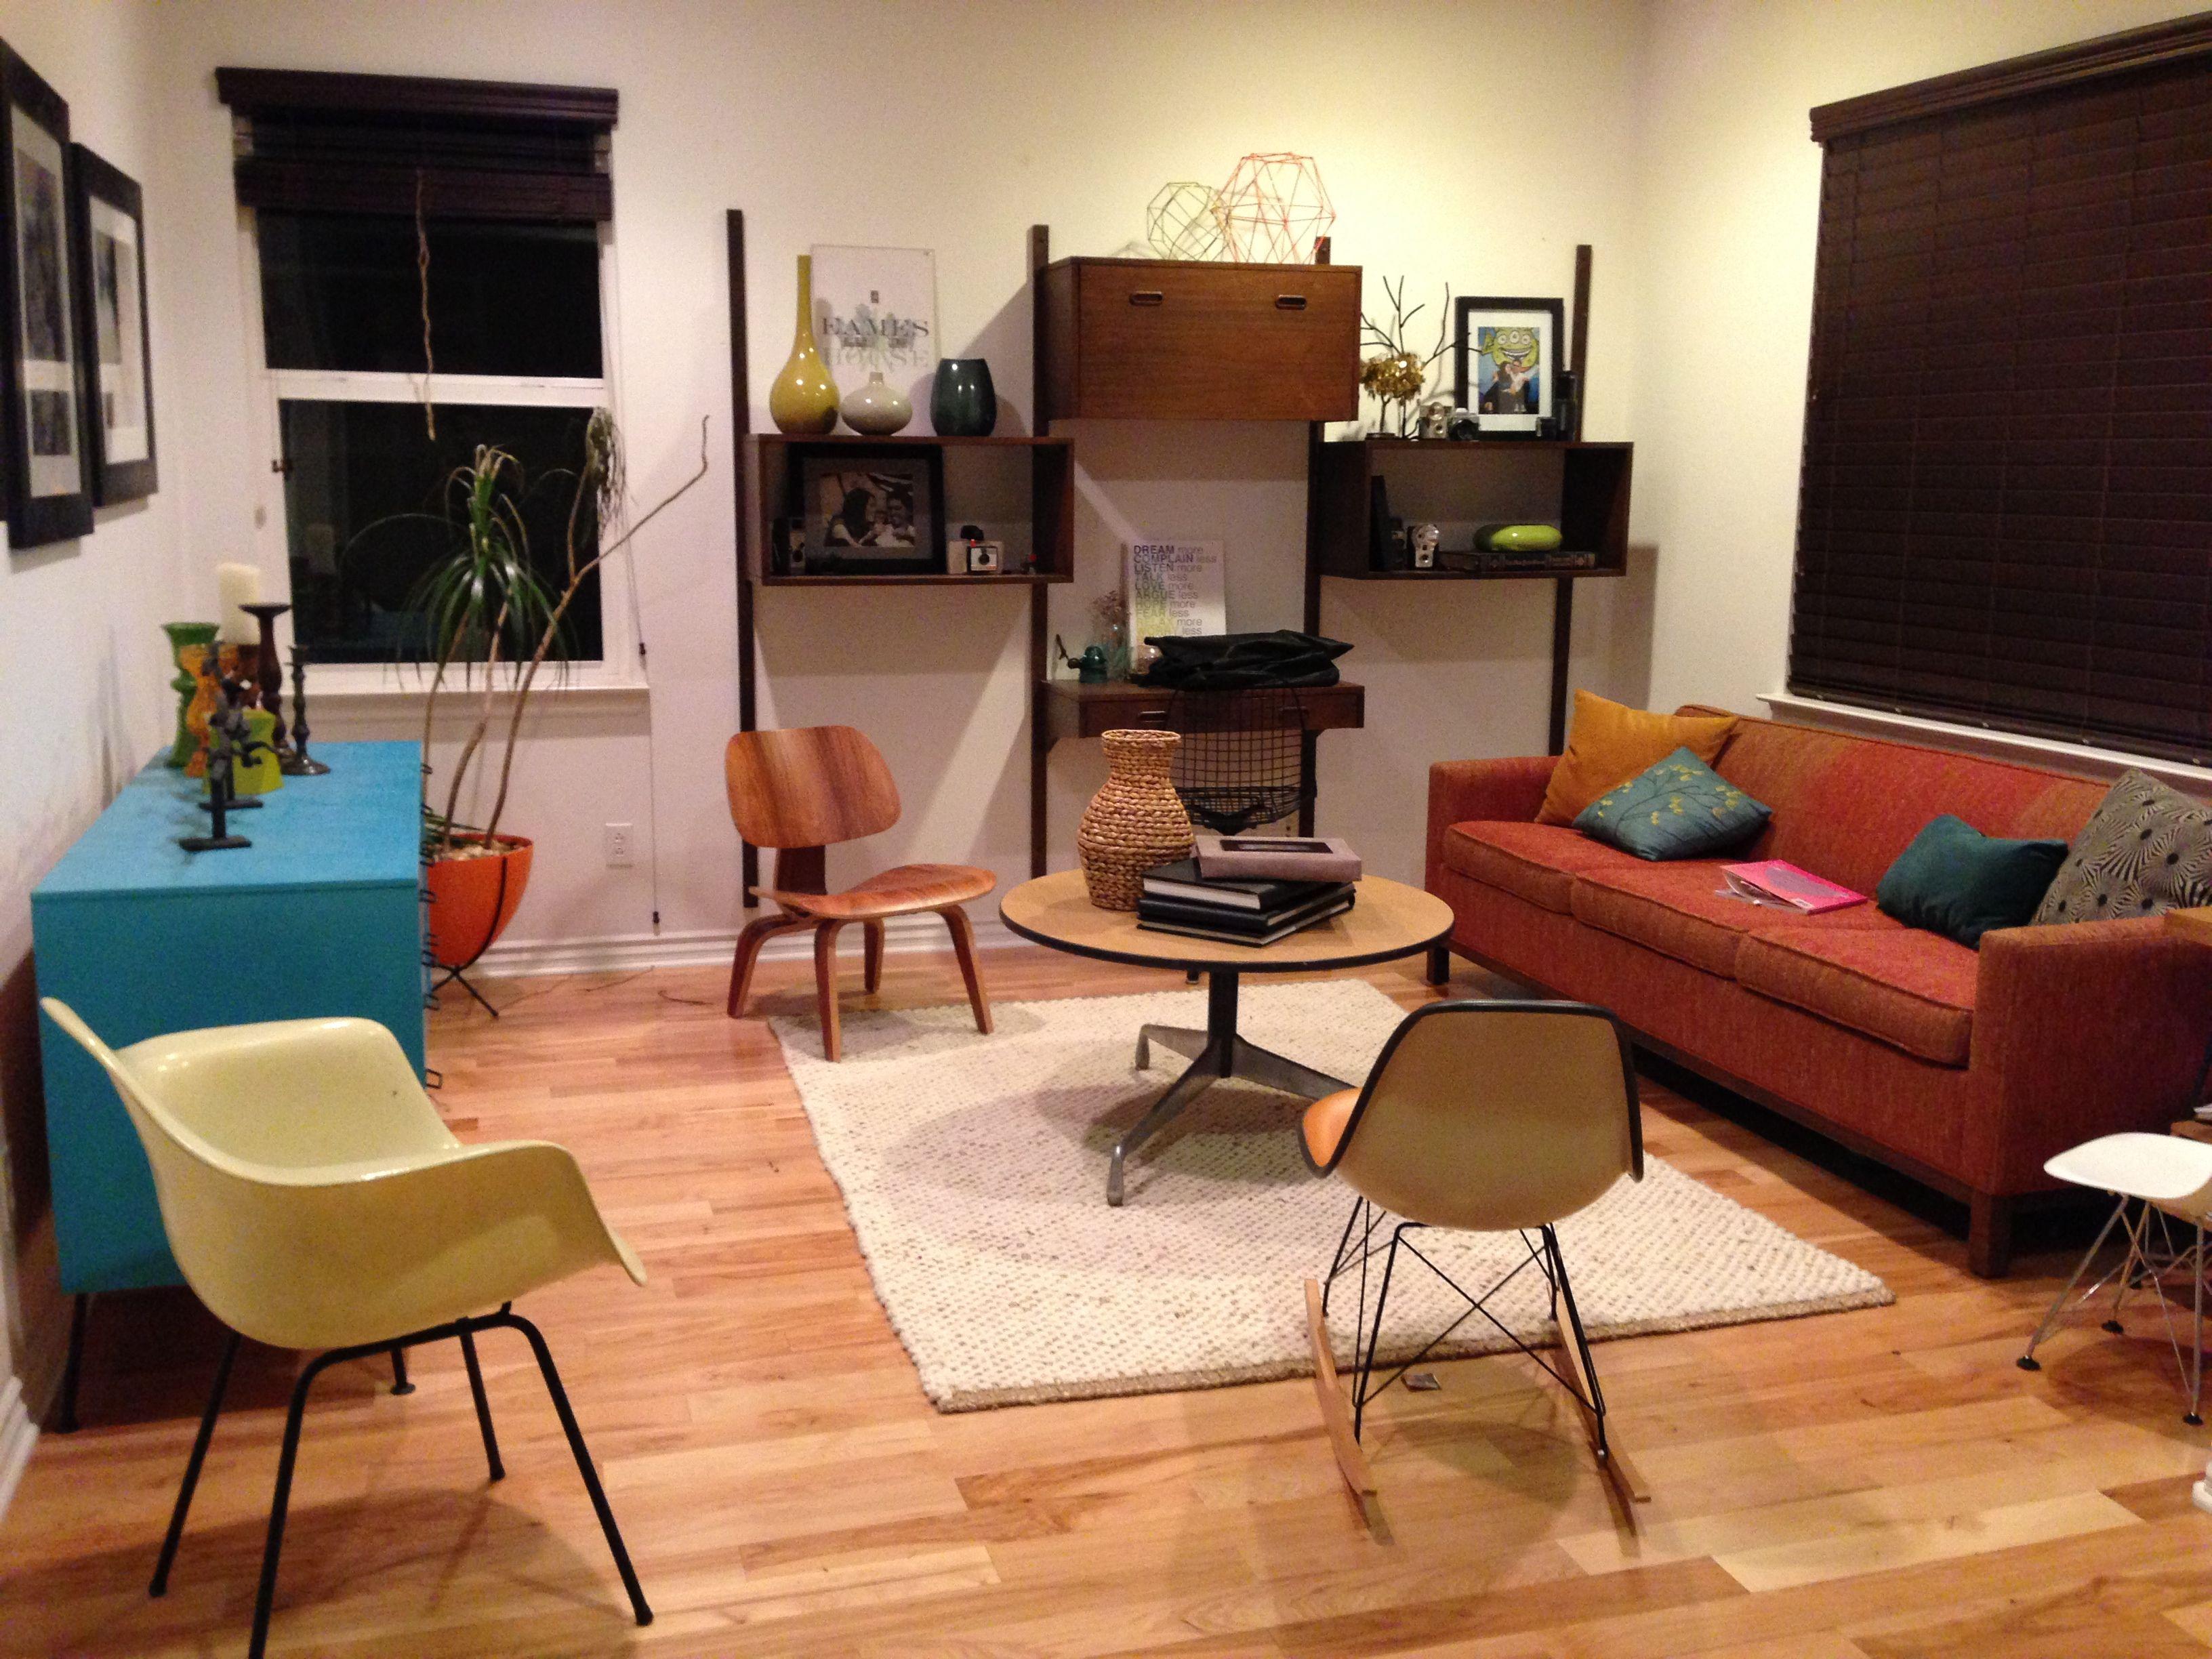 Mid century modern living room retro home decor pinterest - Mid century modern living room ...